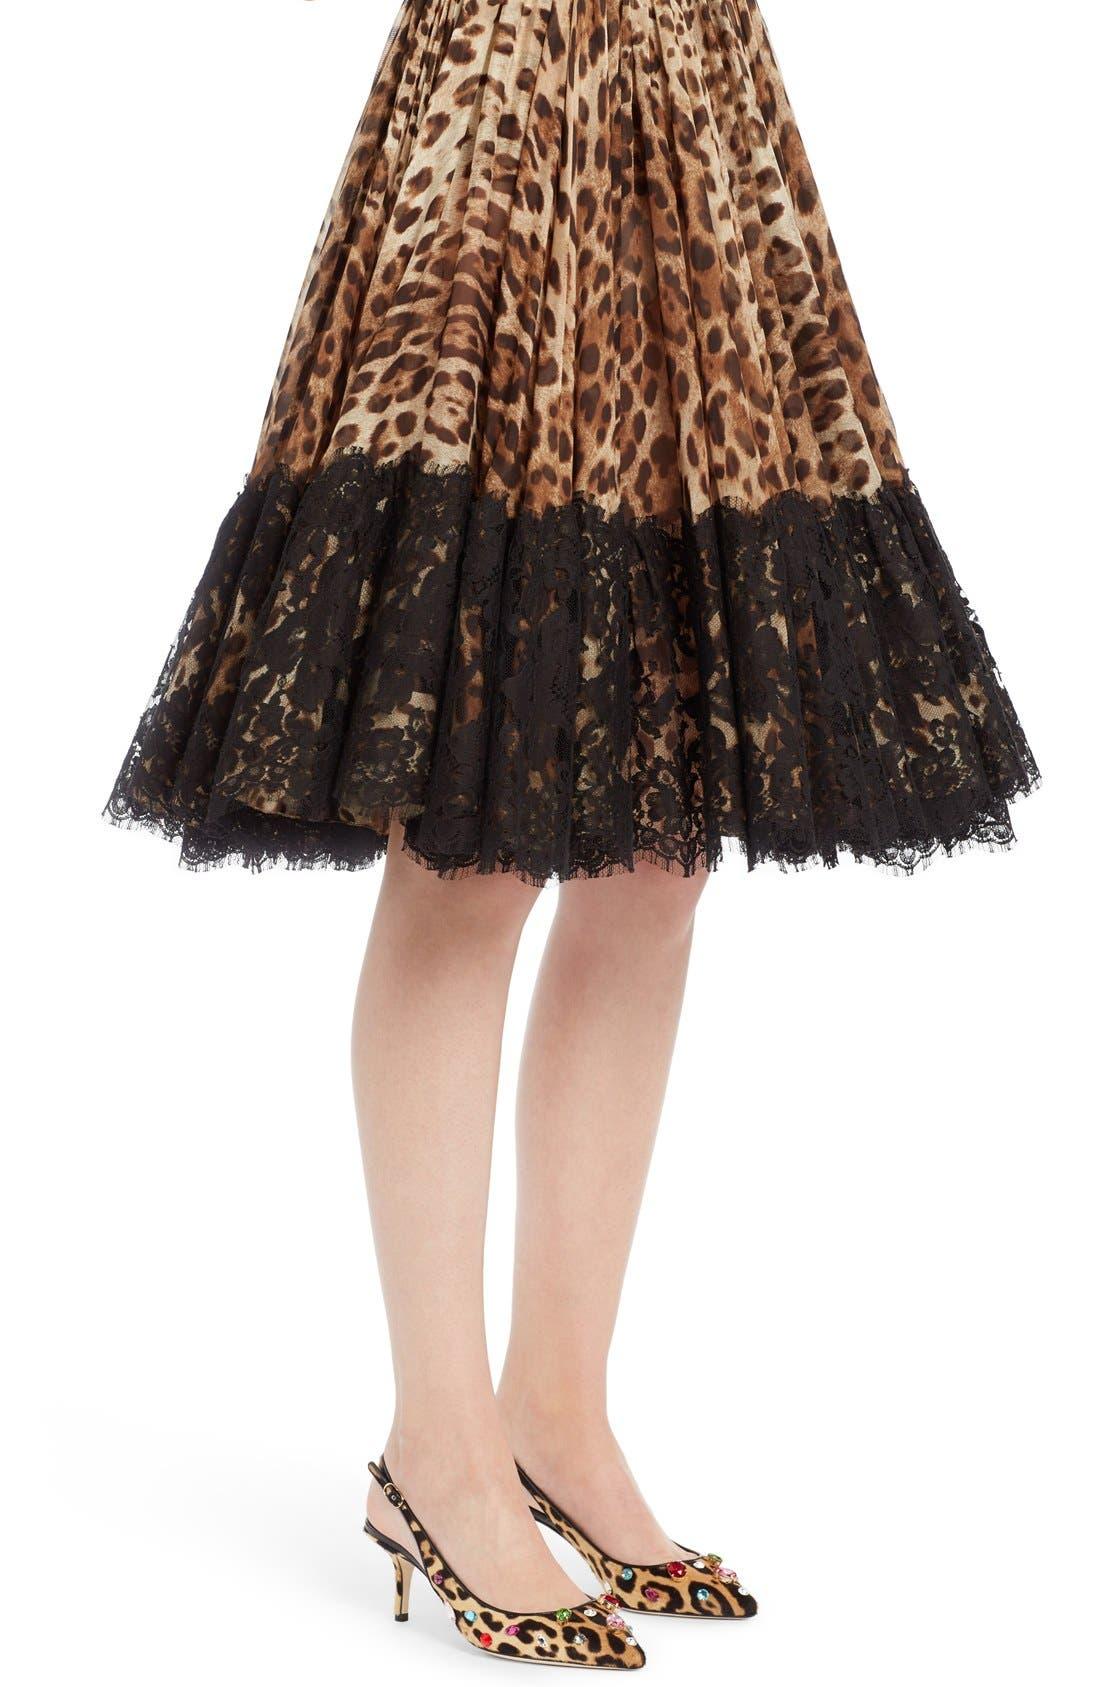 Lace Overlay Leopard Print Chiffon Full Skirt,                             Alternate thumbnail 5, color,                             Leopard